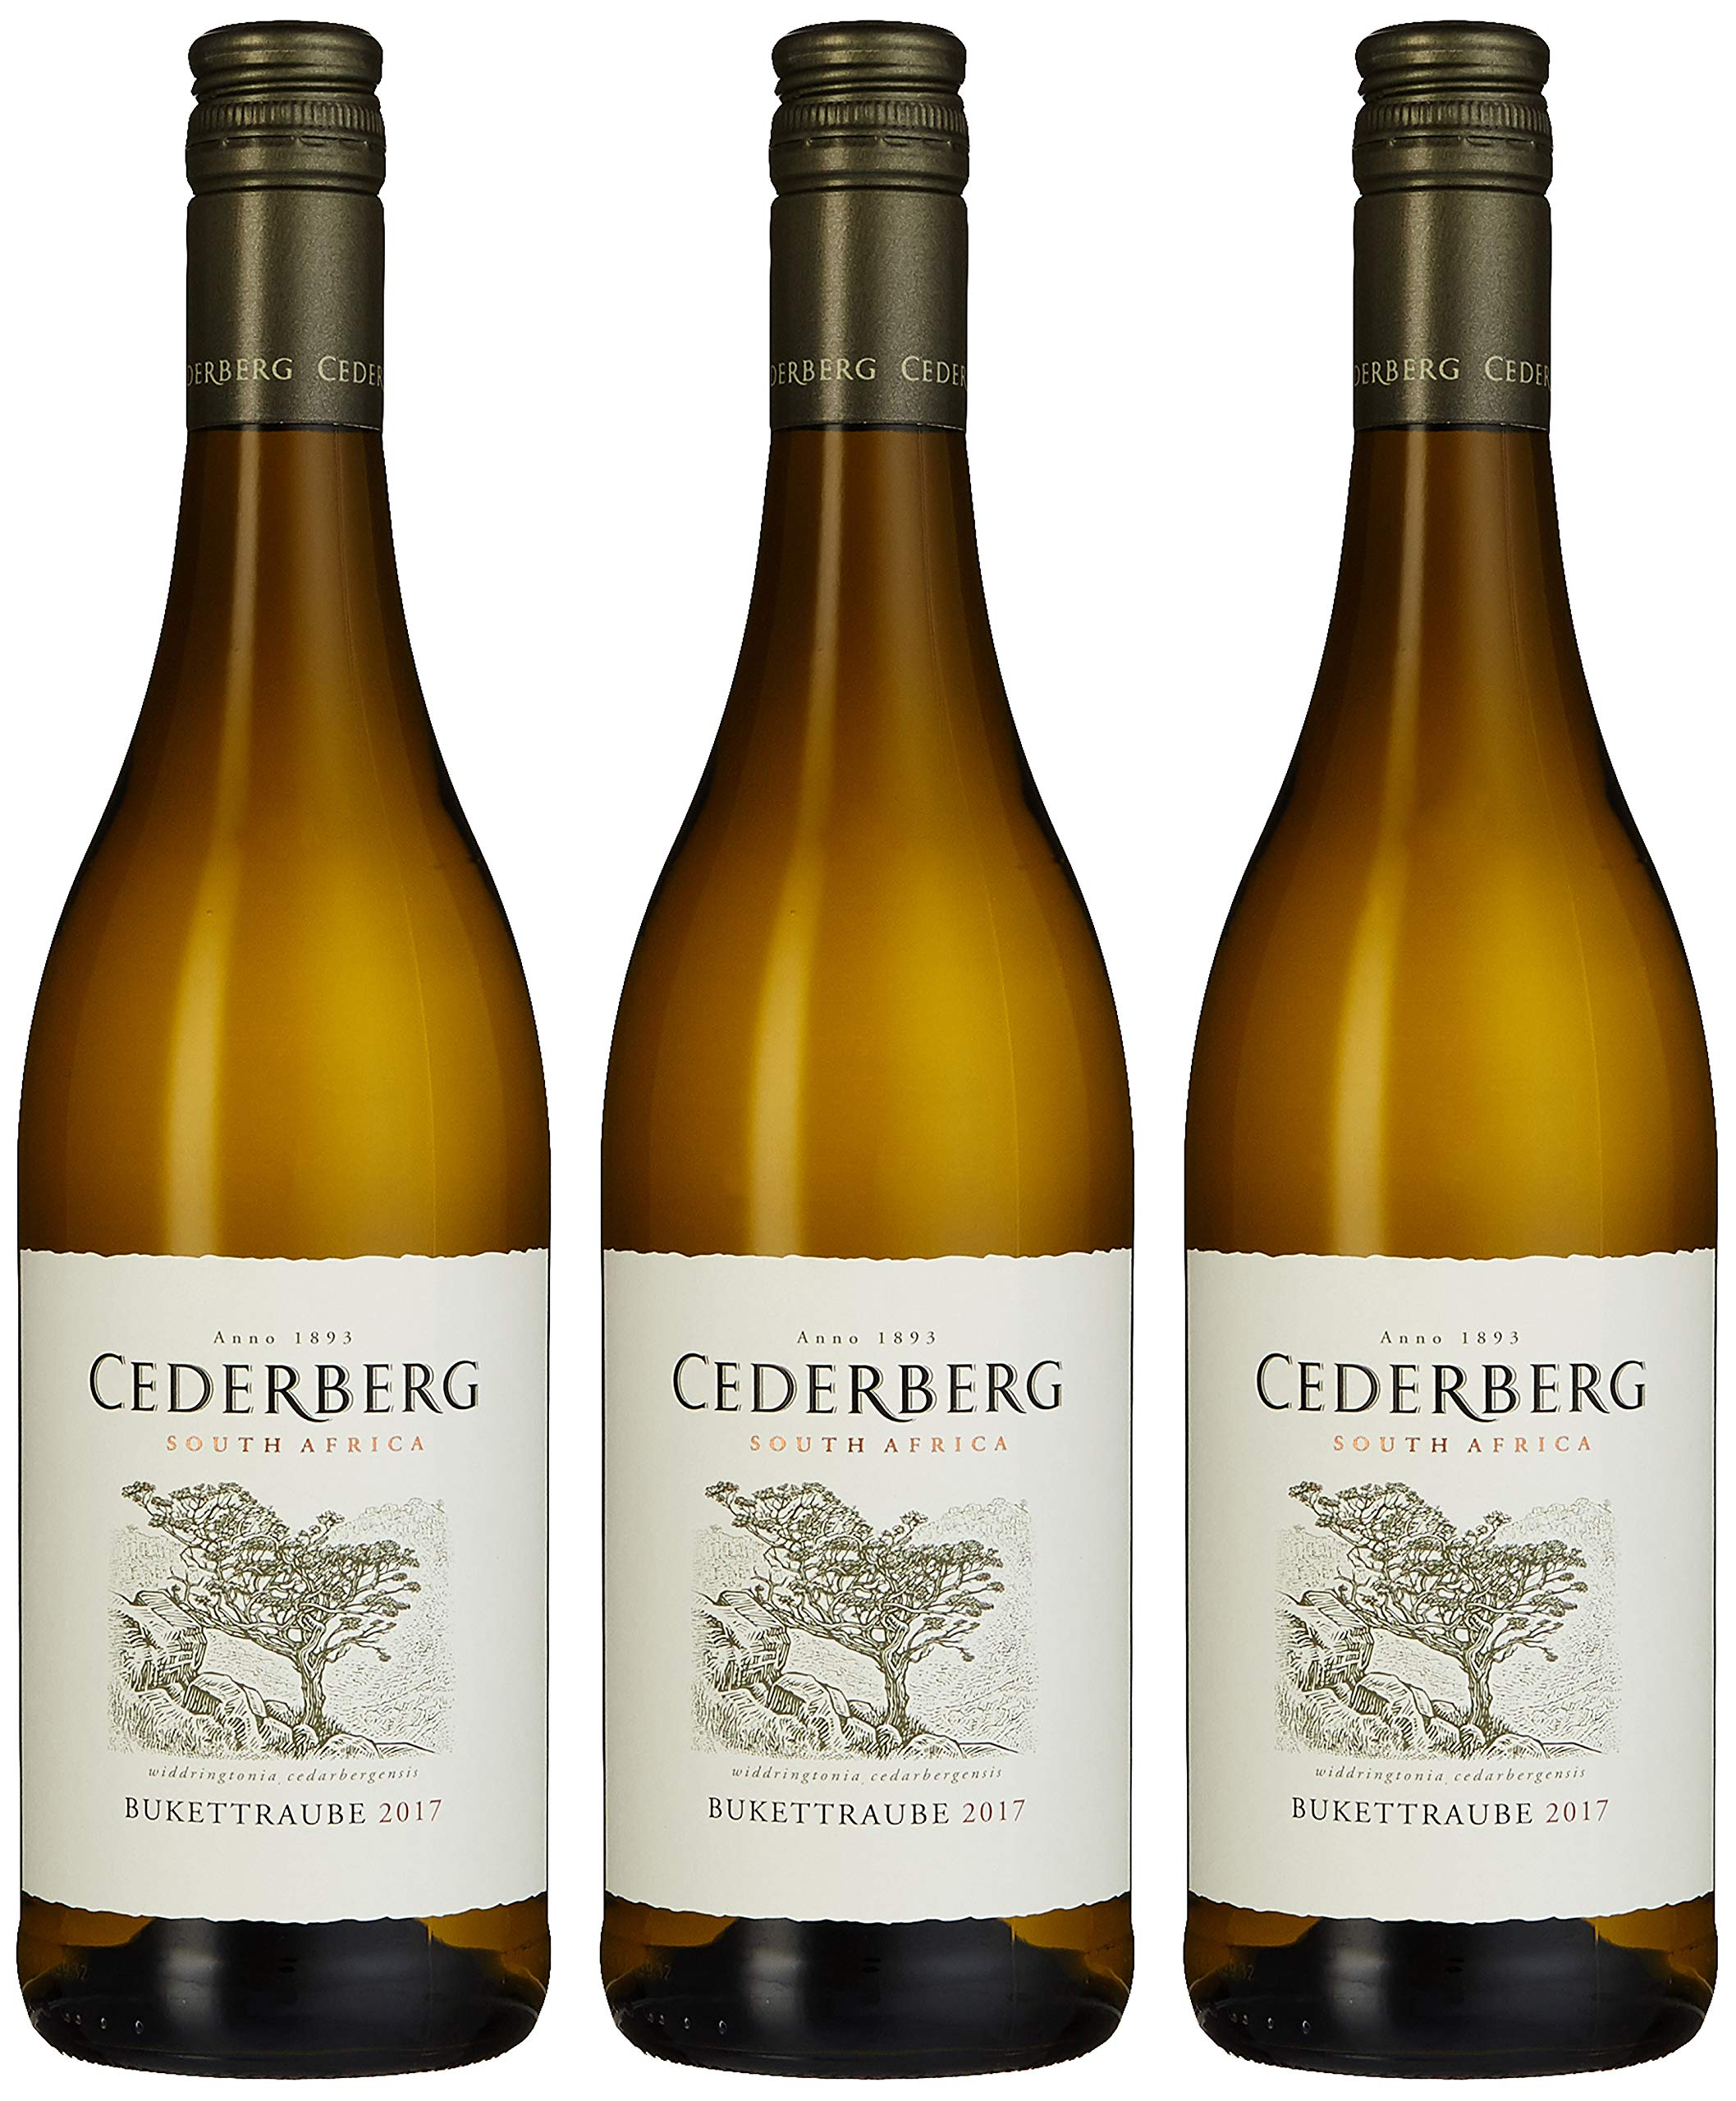 Cederberg-Bukettraube-20162017-3-x-075-l